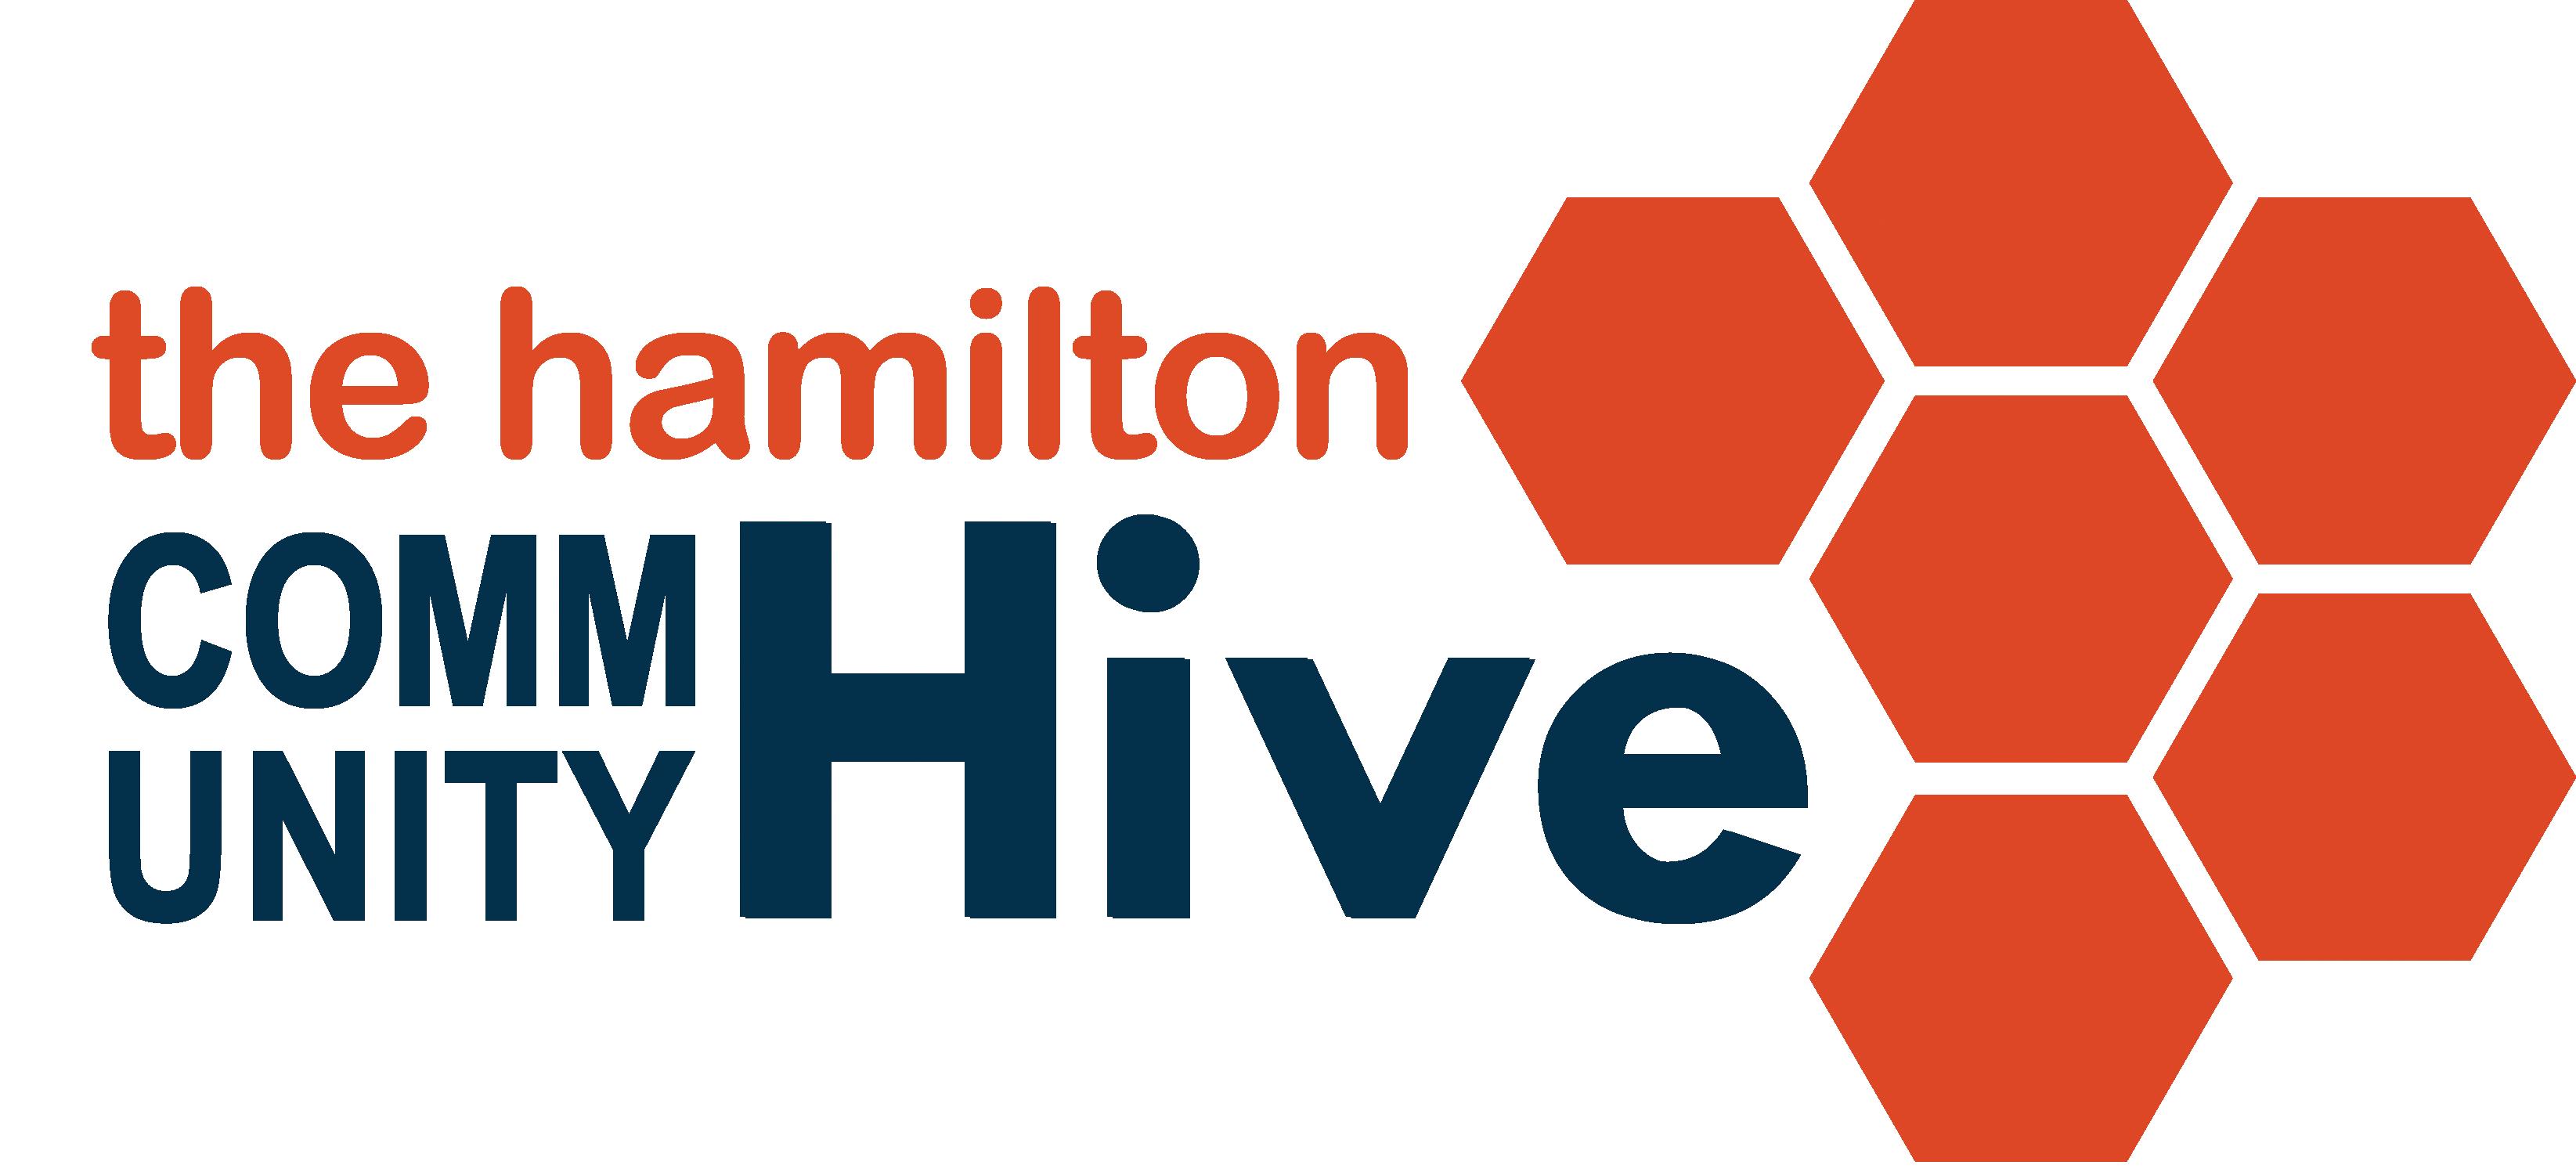 The Hamilton Community Hive